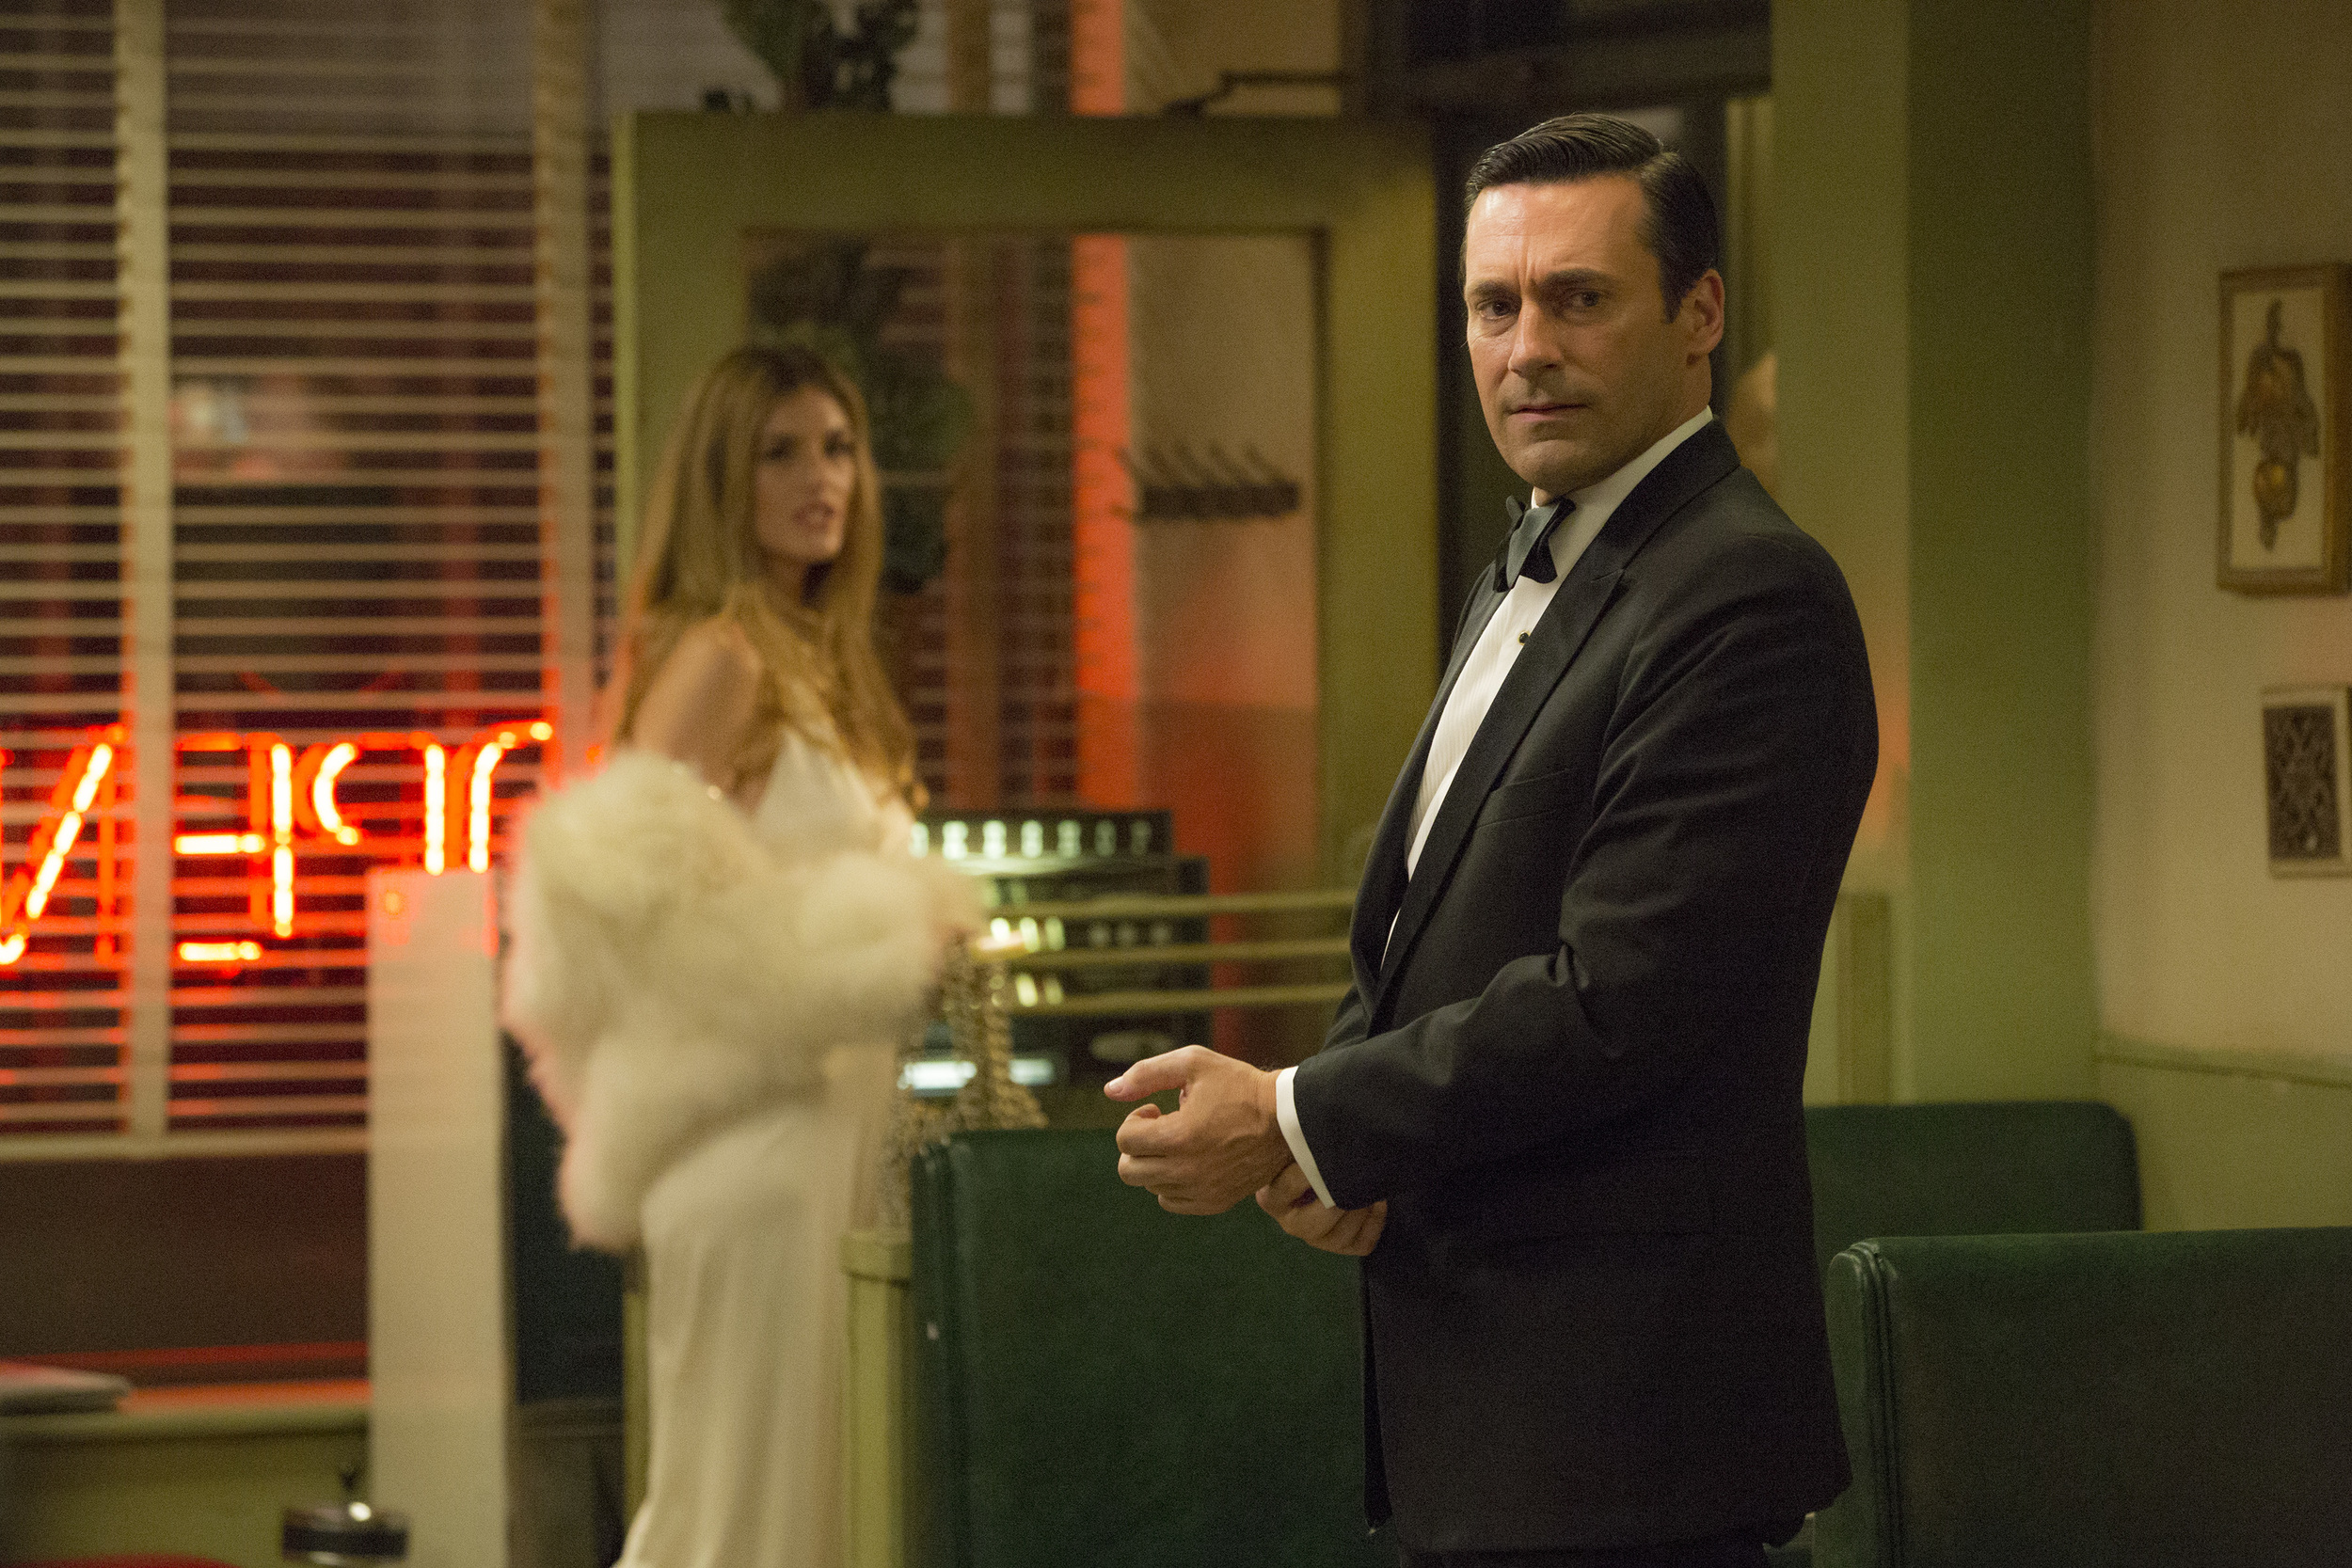 Maliabeth Johnson as Audrey and Jon Hamm as Don Draper - Mad Men _ Season 7B, Episode 8 - Photo Credit: Michael Yarish/AMC